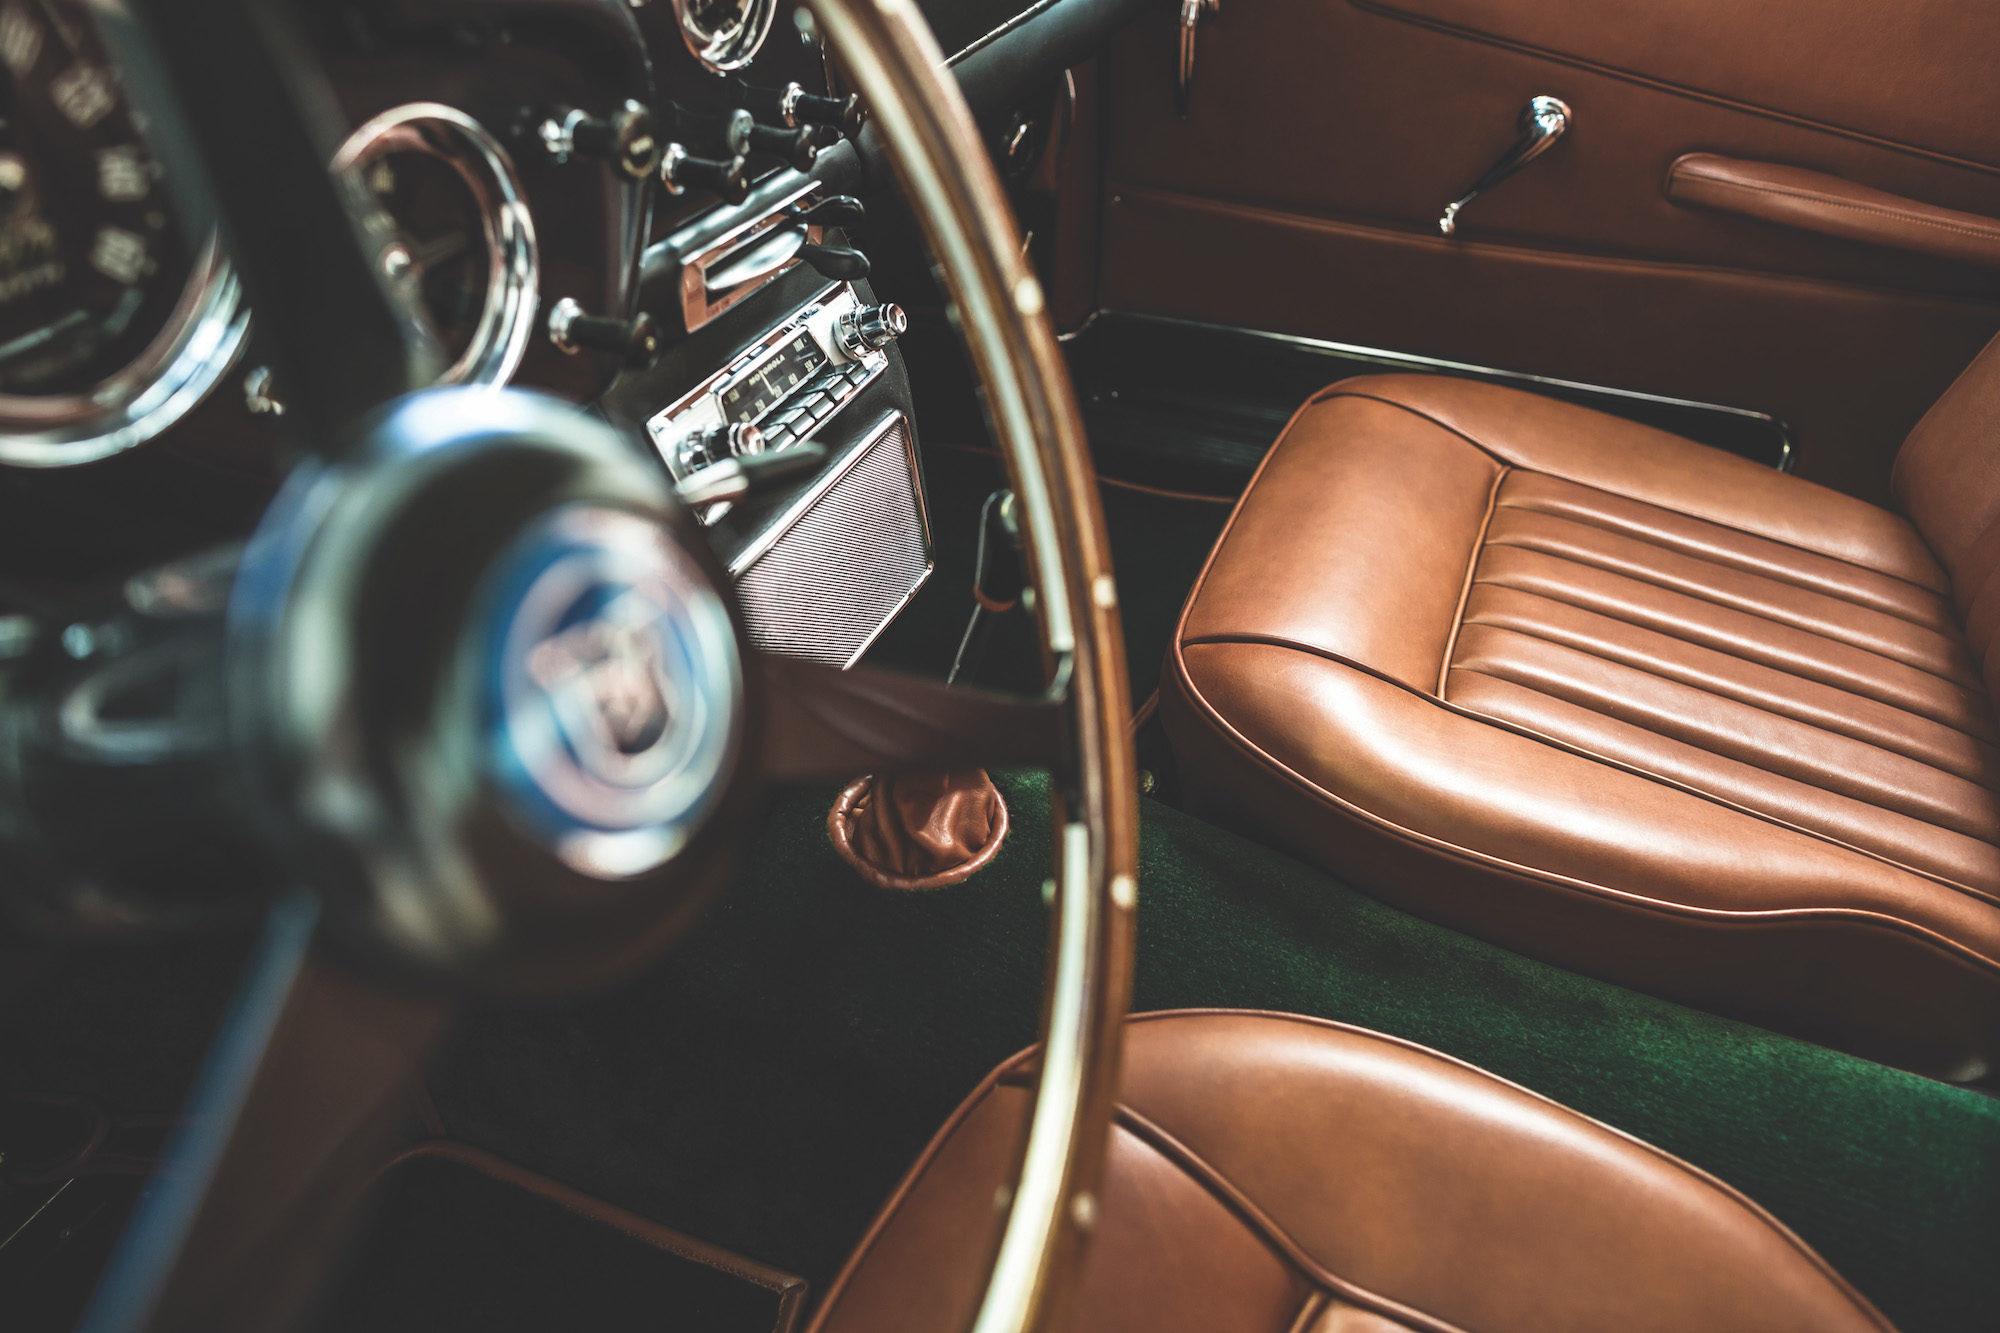 car-interior-hermes-Alexis-goure-2000x1333